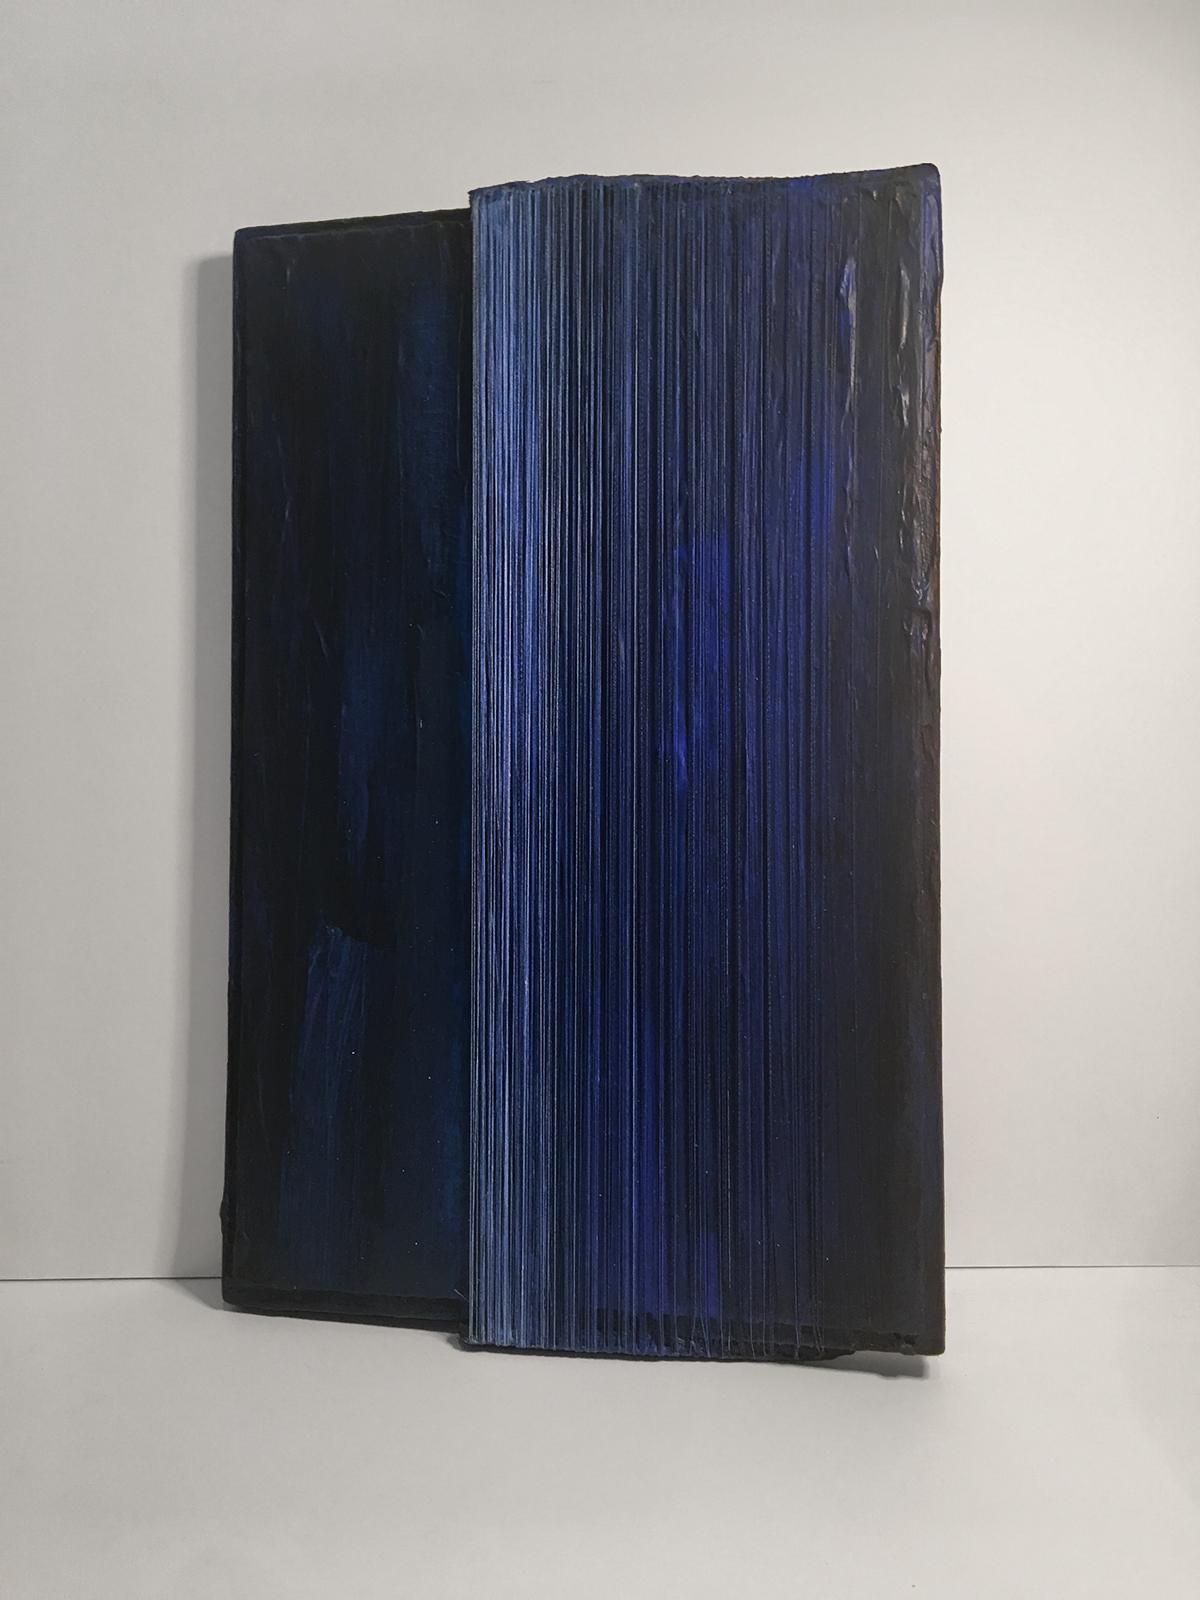 ATLANTIC NIGHT   Acrylic, canvas, thread  14 x 7 Inches